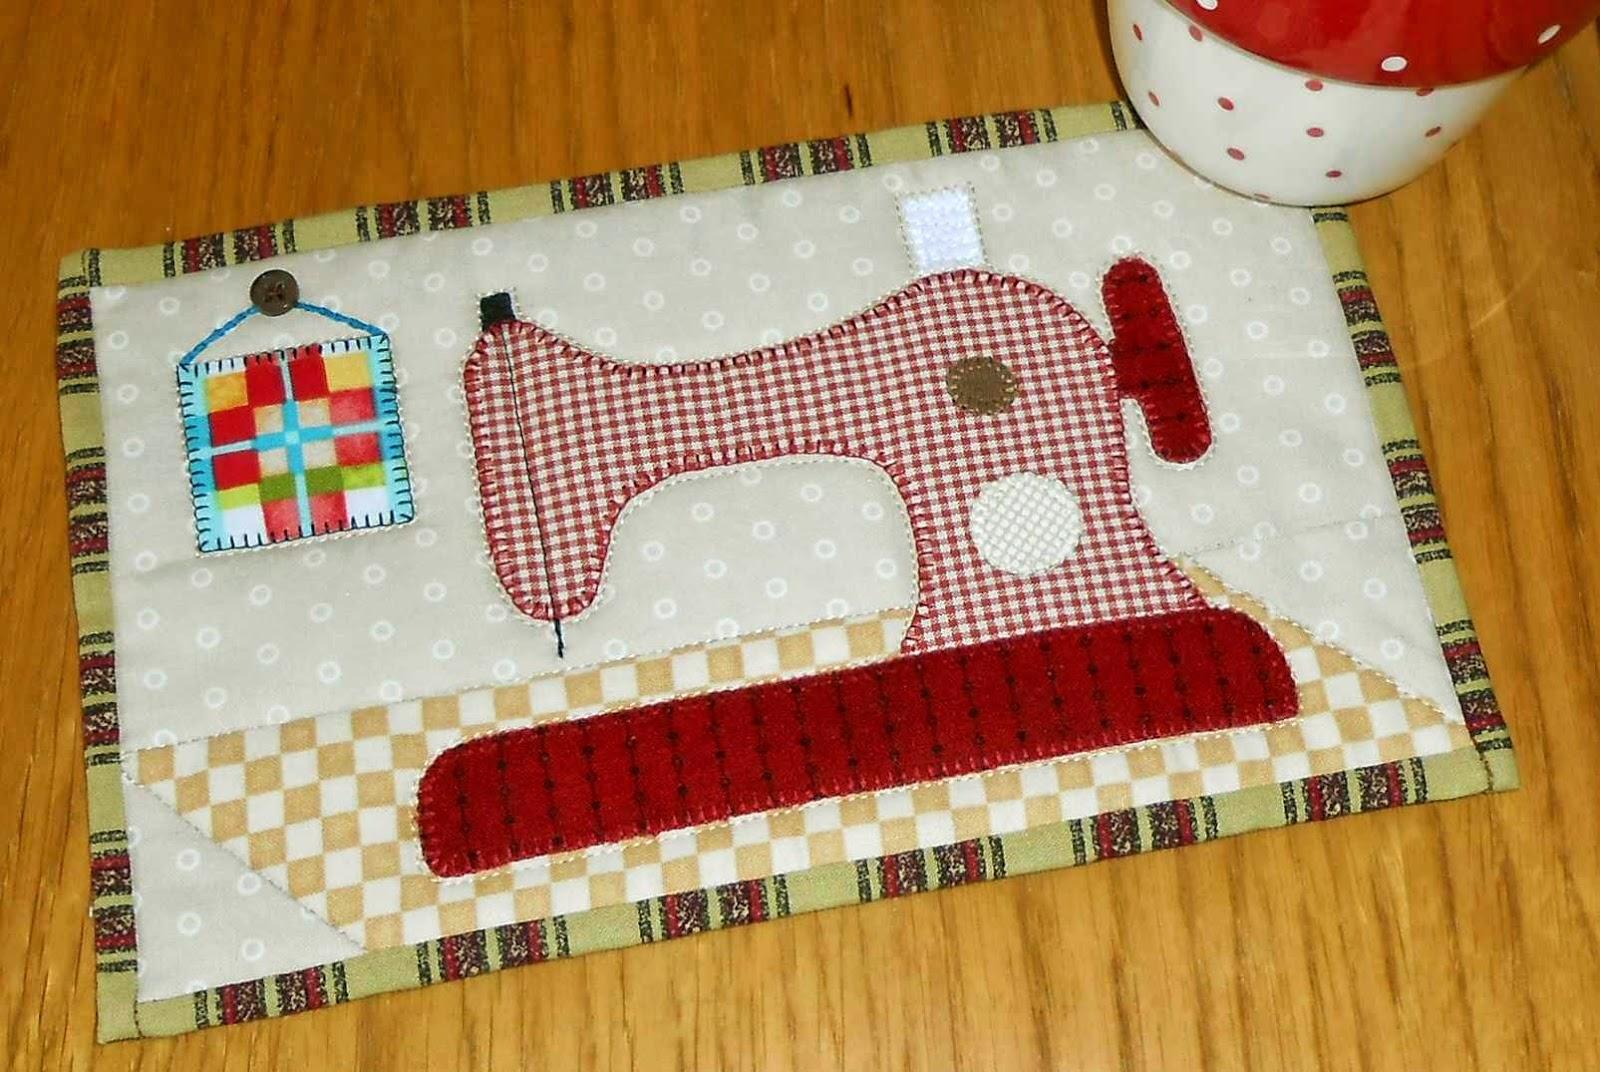 http://www.craftsy.com/pattern/quilting/home-decor/sewing-machine-mug-rug/94623